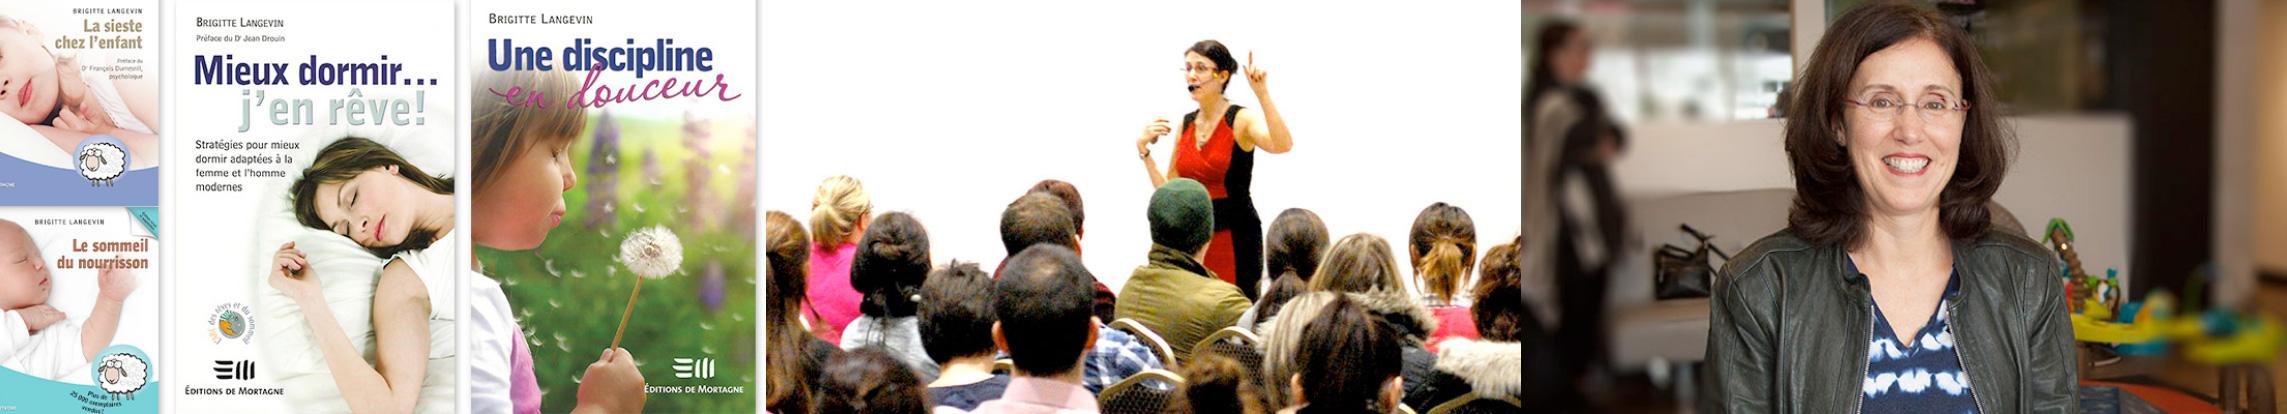 Brigitte Langevin in conference